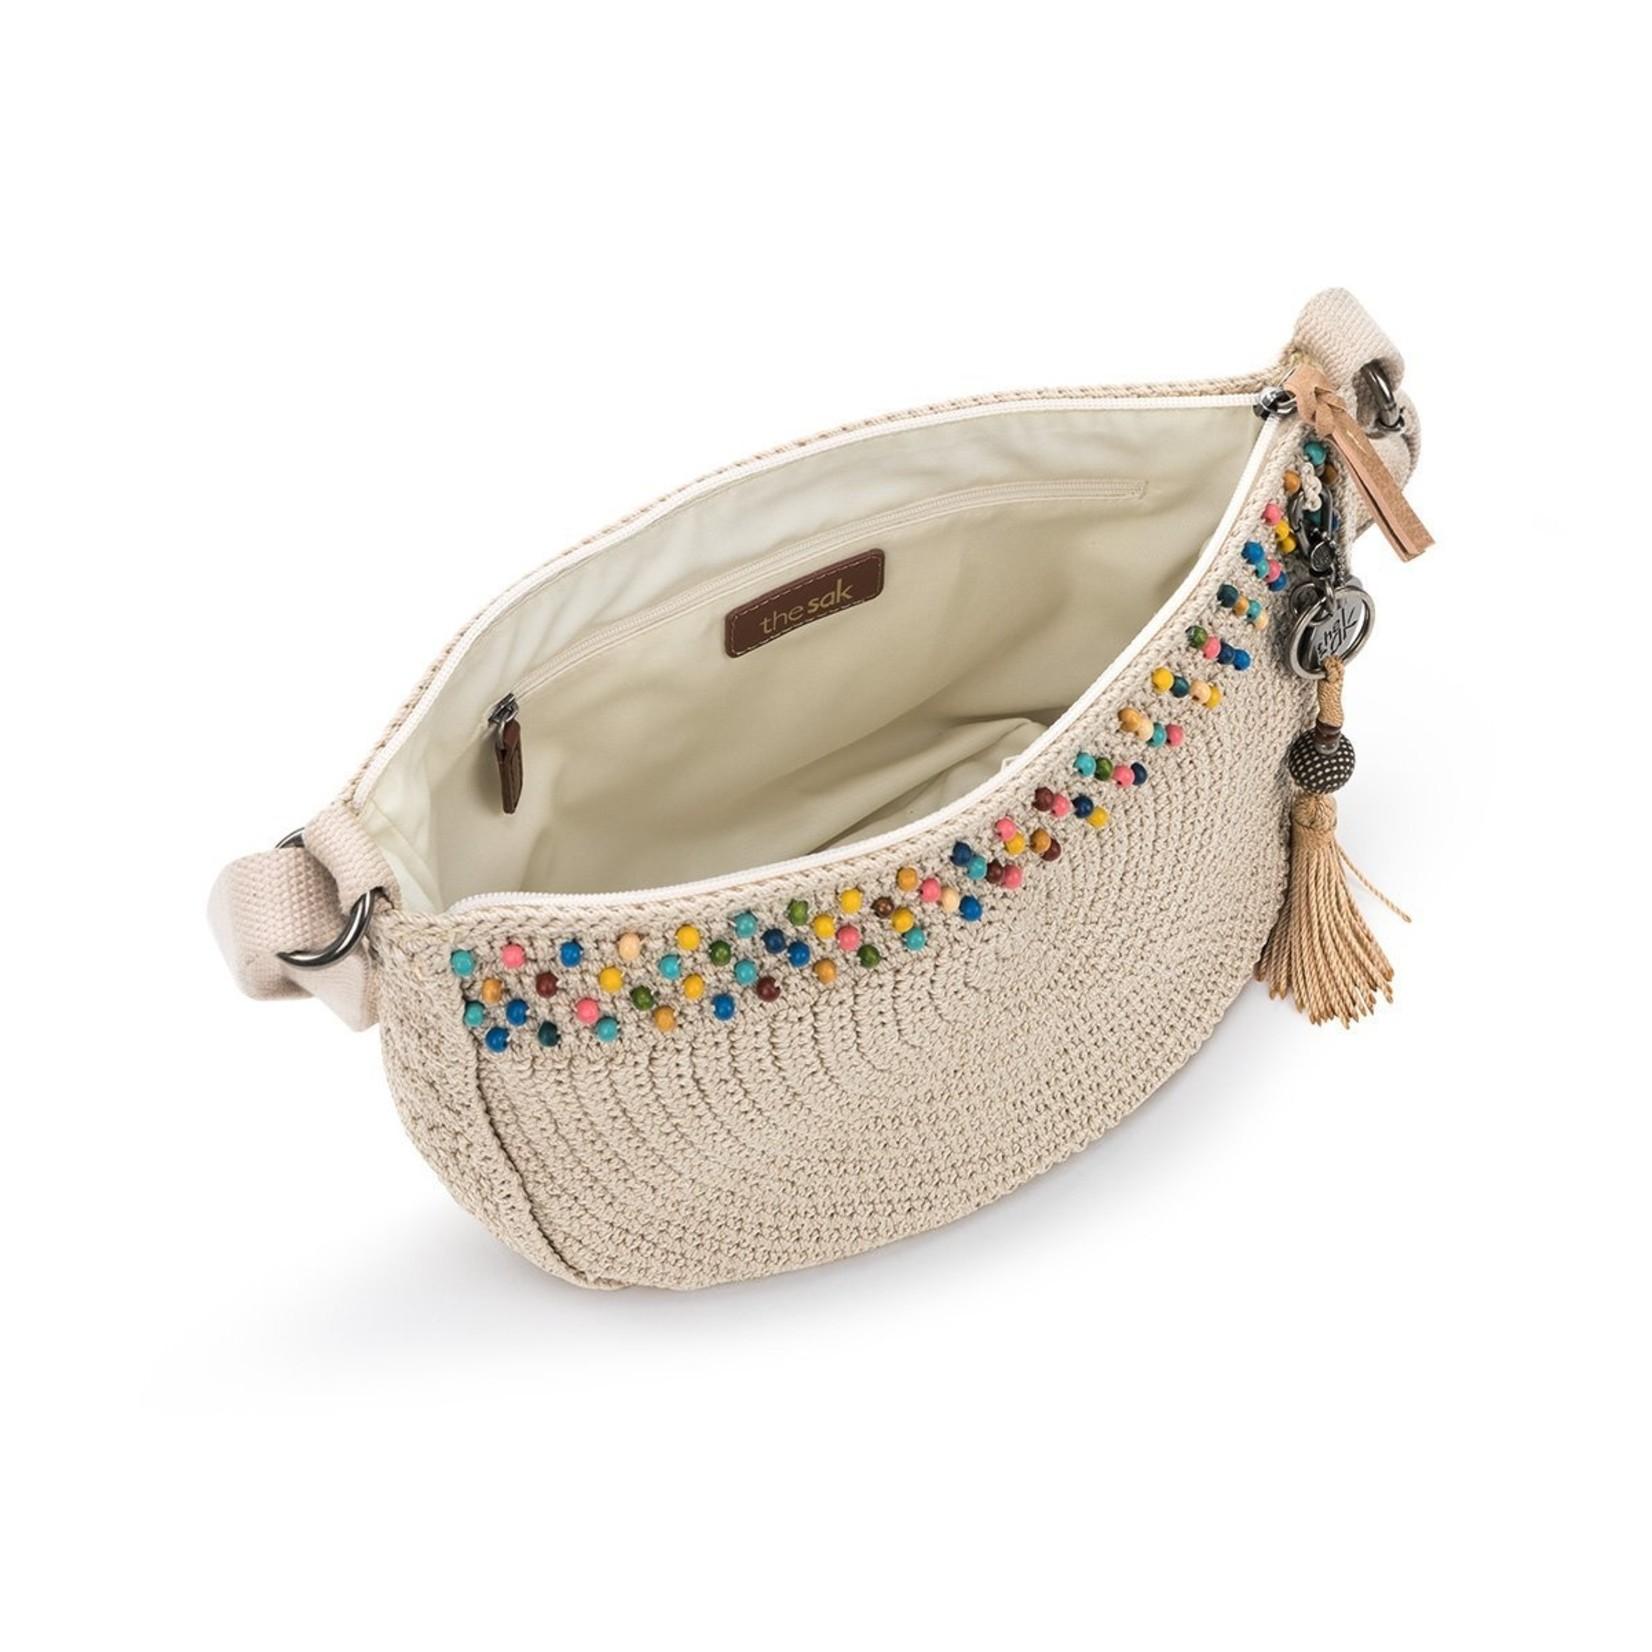 The Sak Ryder Crochet Crossbody - Ecru Beads